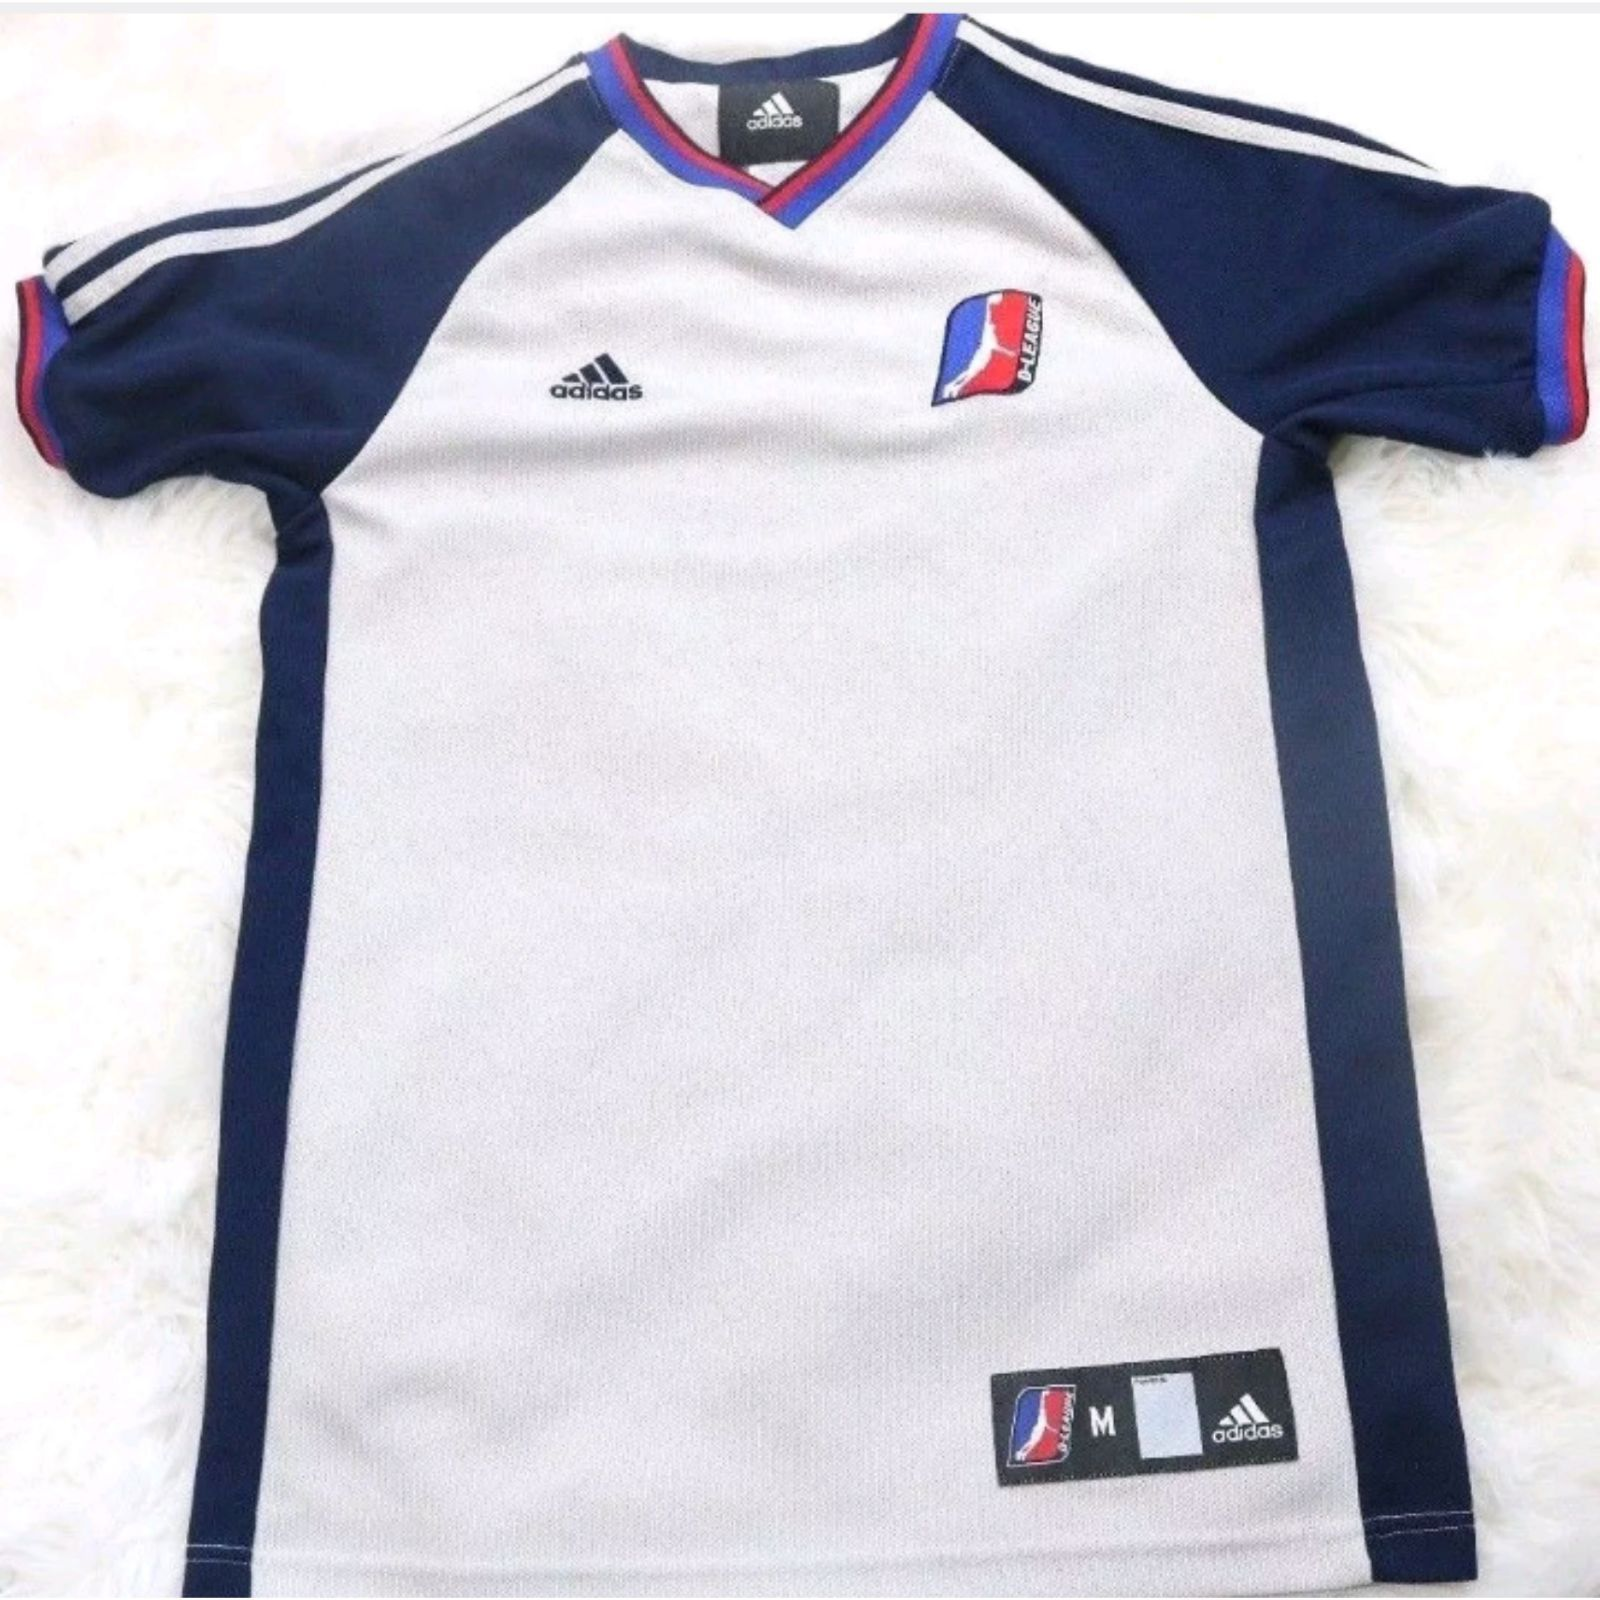 e8380b811 Cool item  Adidas NBA D-League Referee Shirt Sz M